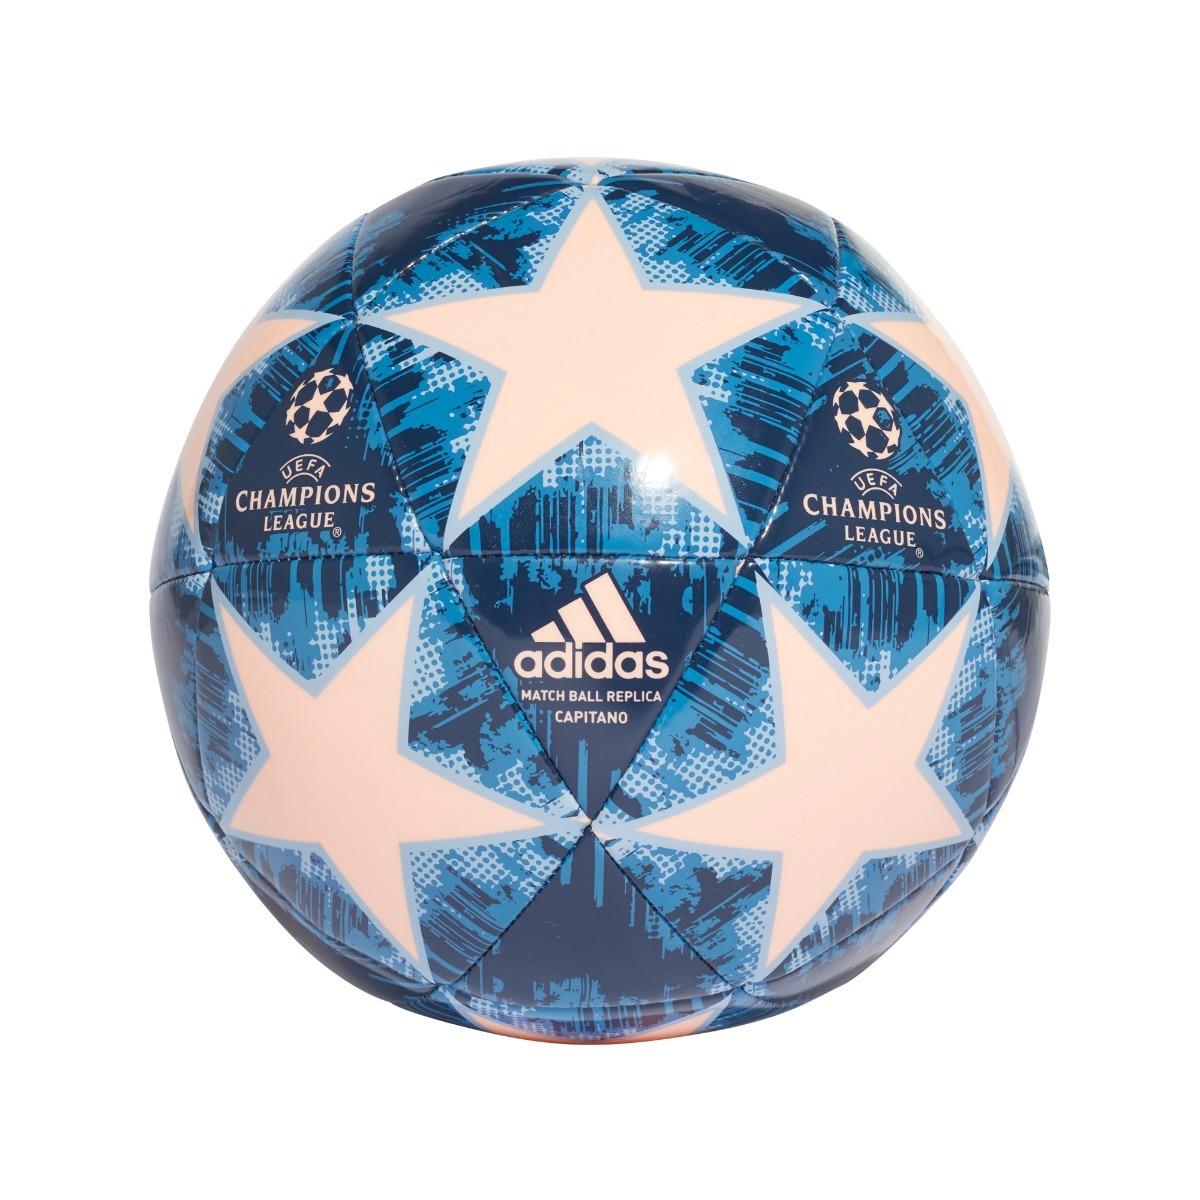 Pelota de fútbol champions league global sports cargando zoom jpg 1200x1200  Pelota de futbol la champions 1e12293ebd87e